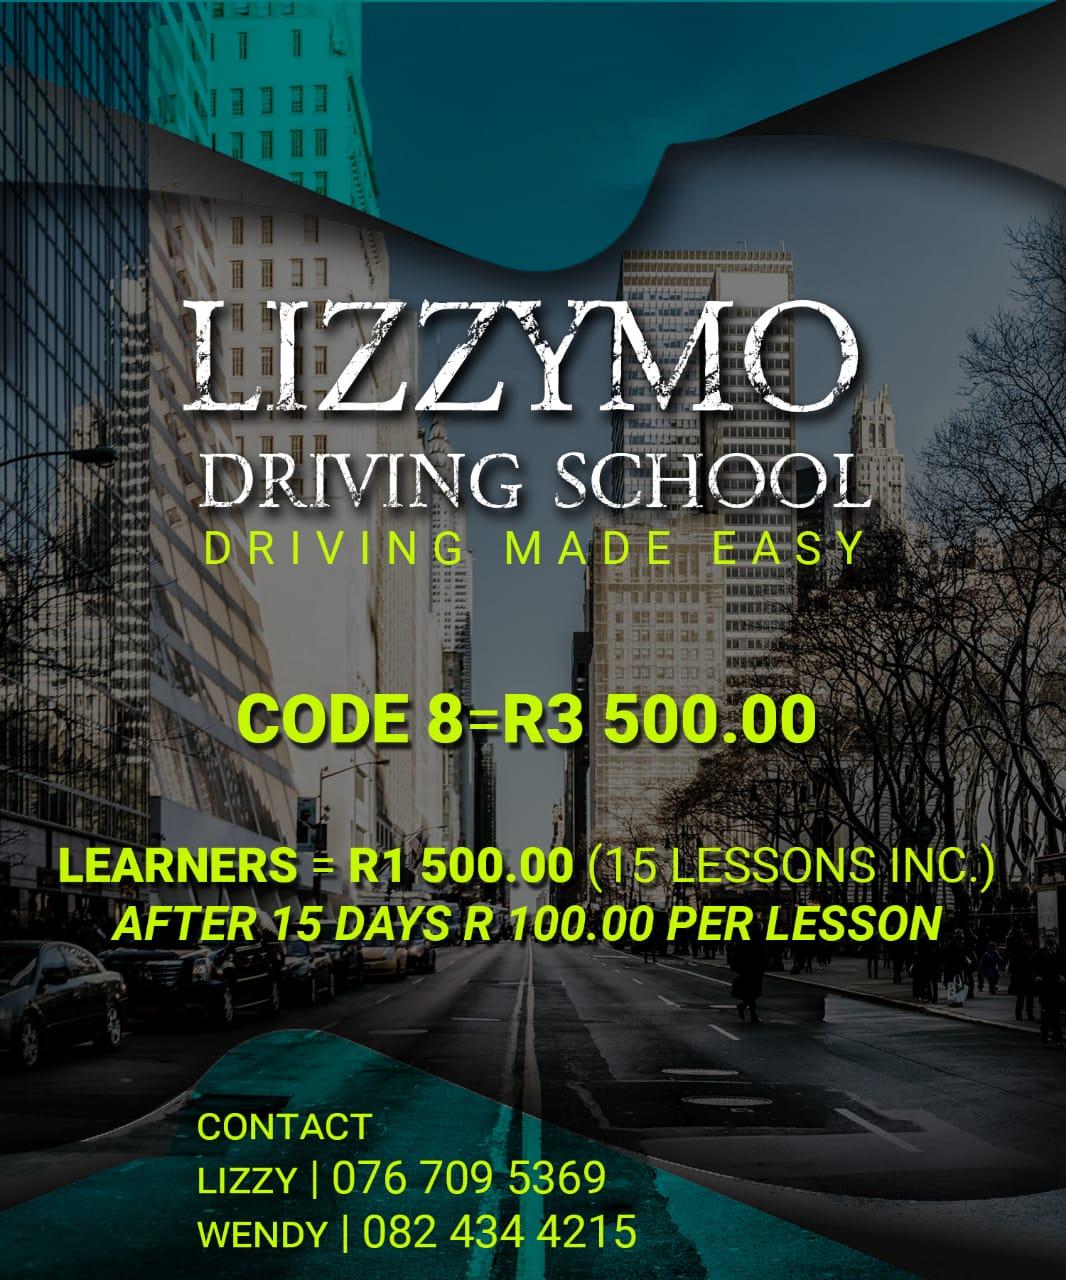 LIZZYMO DRIVING SCHOOL